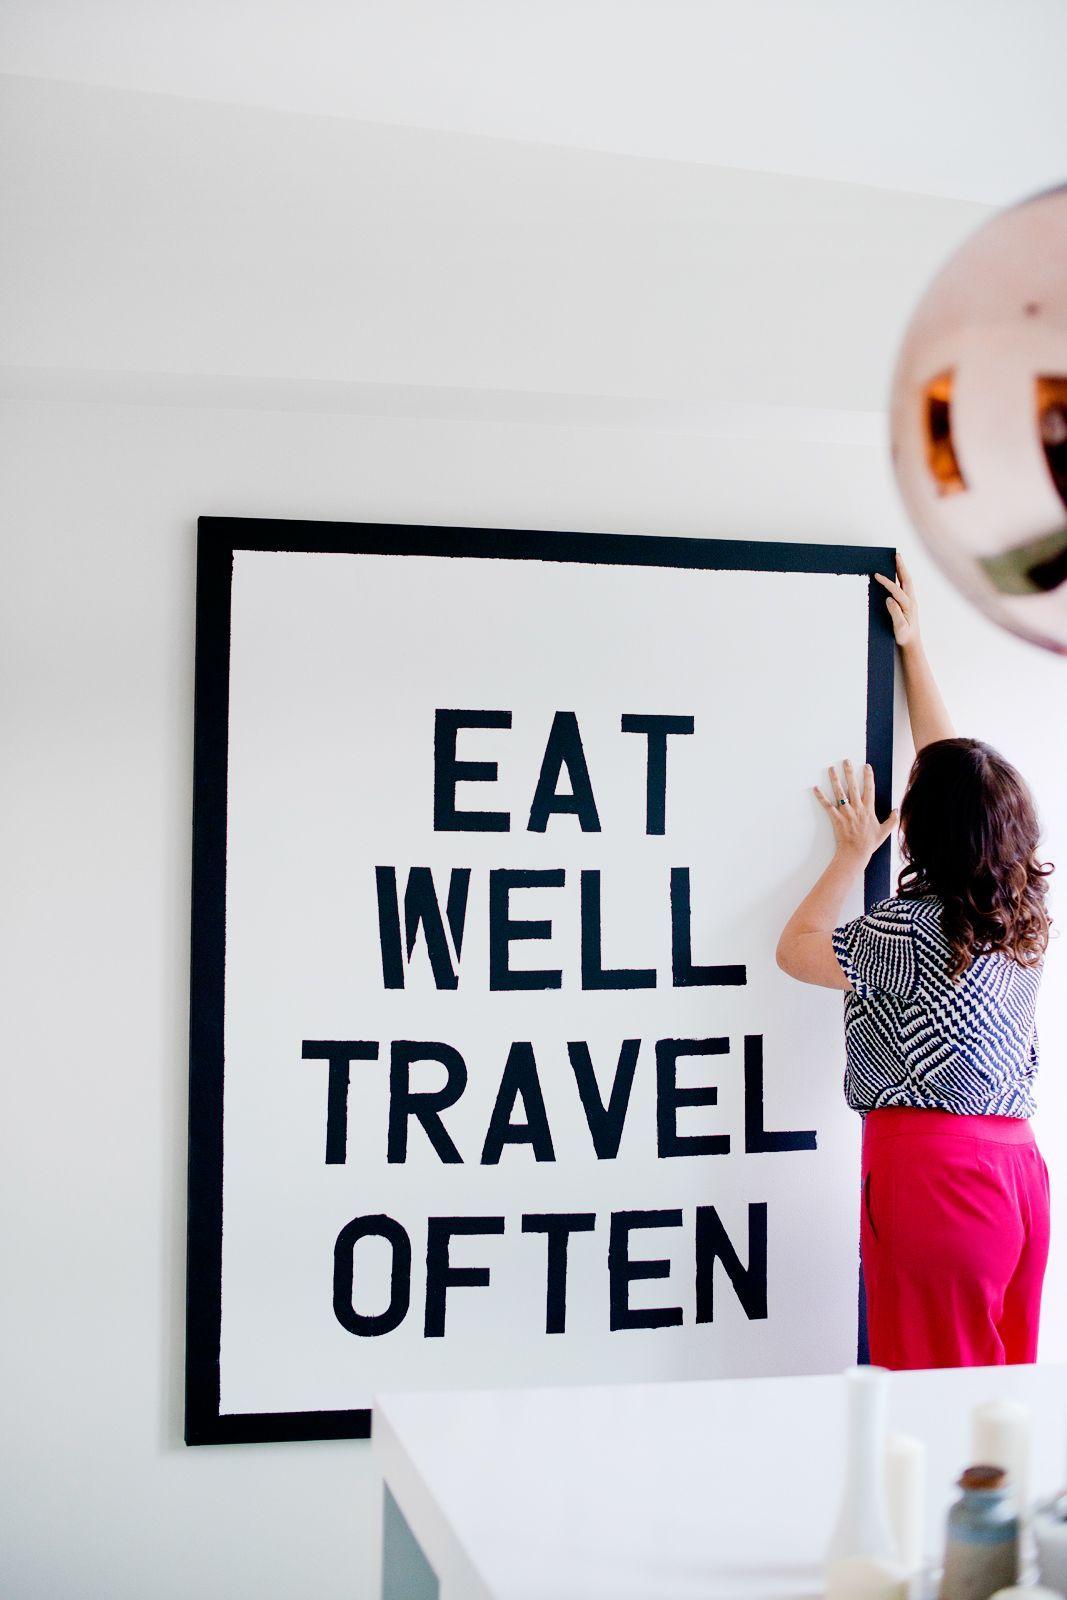 Katalina mayorga diy home design tips ideas pointers interiors